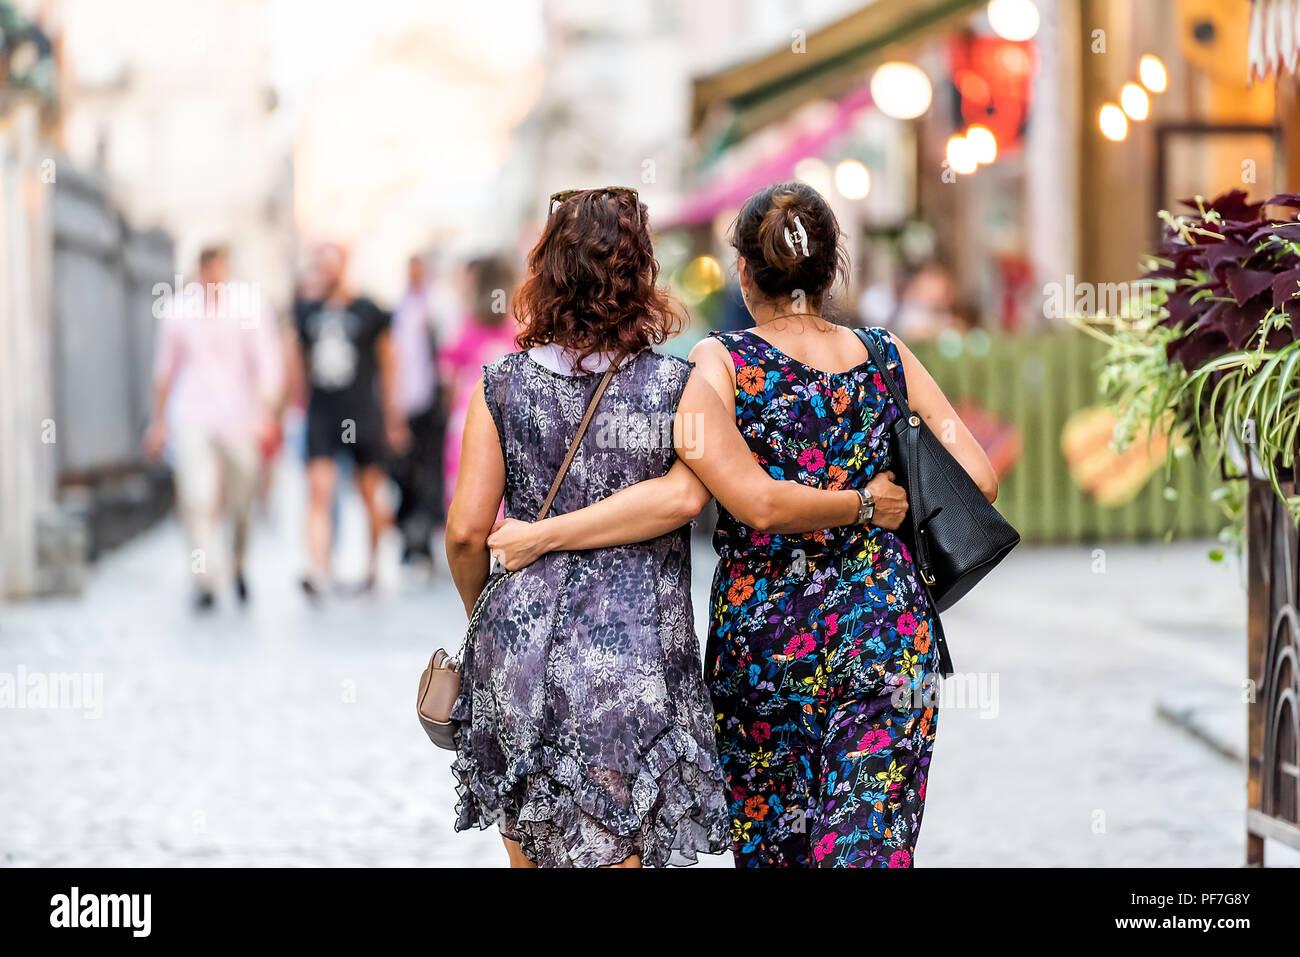 Lviv, Ukraine - July 30, 2018: Two Slavic Eastern European Ukrainian women walking back with arms around each other hugging holding in historic Ukrain - Stock Image